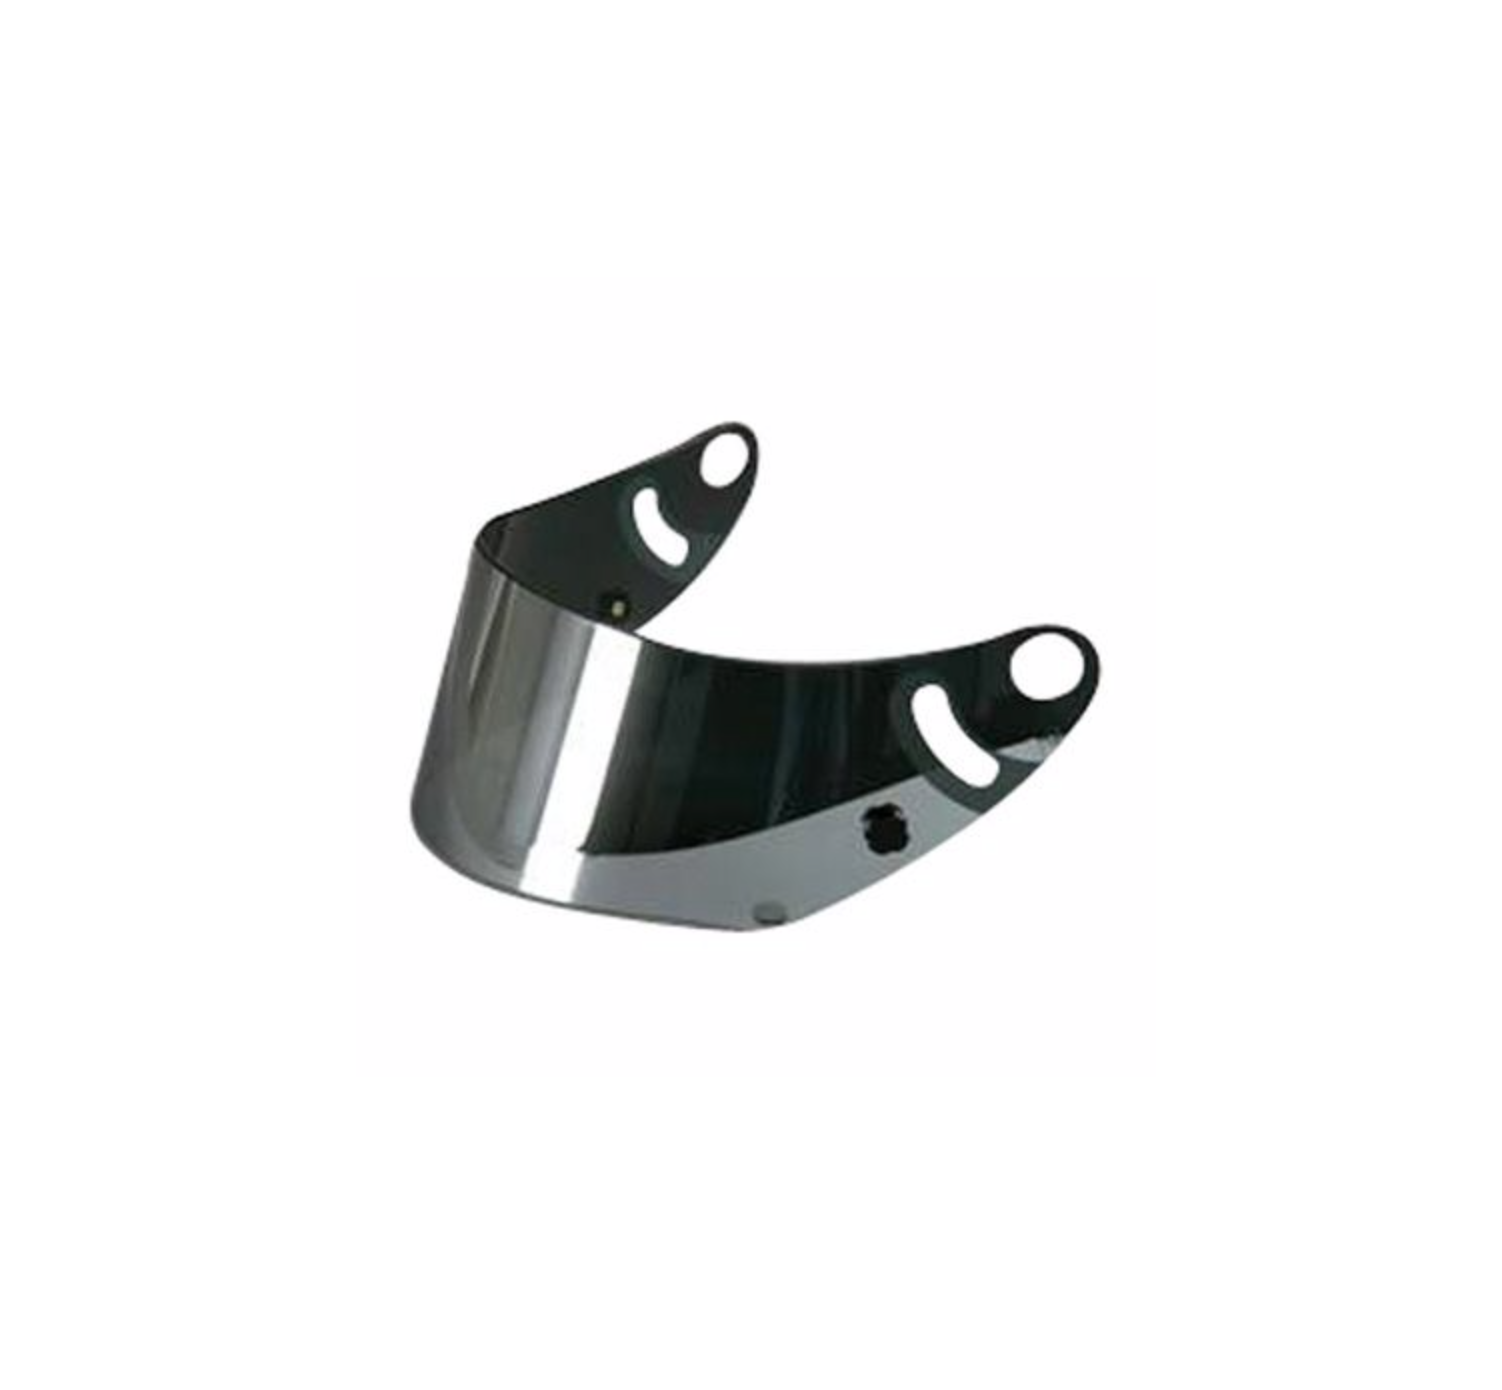 Arai CK6 Spiegelvizier - Zilver